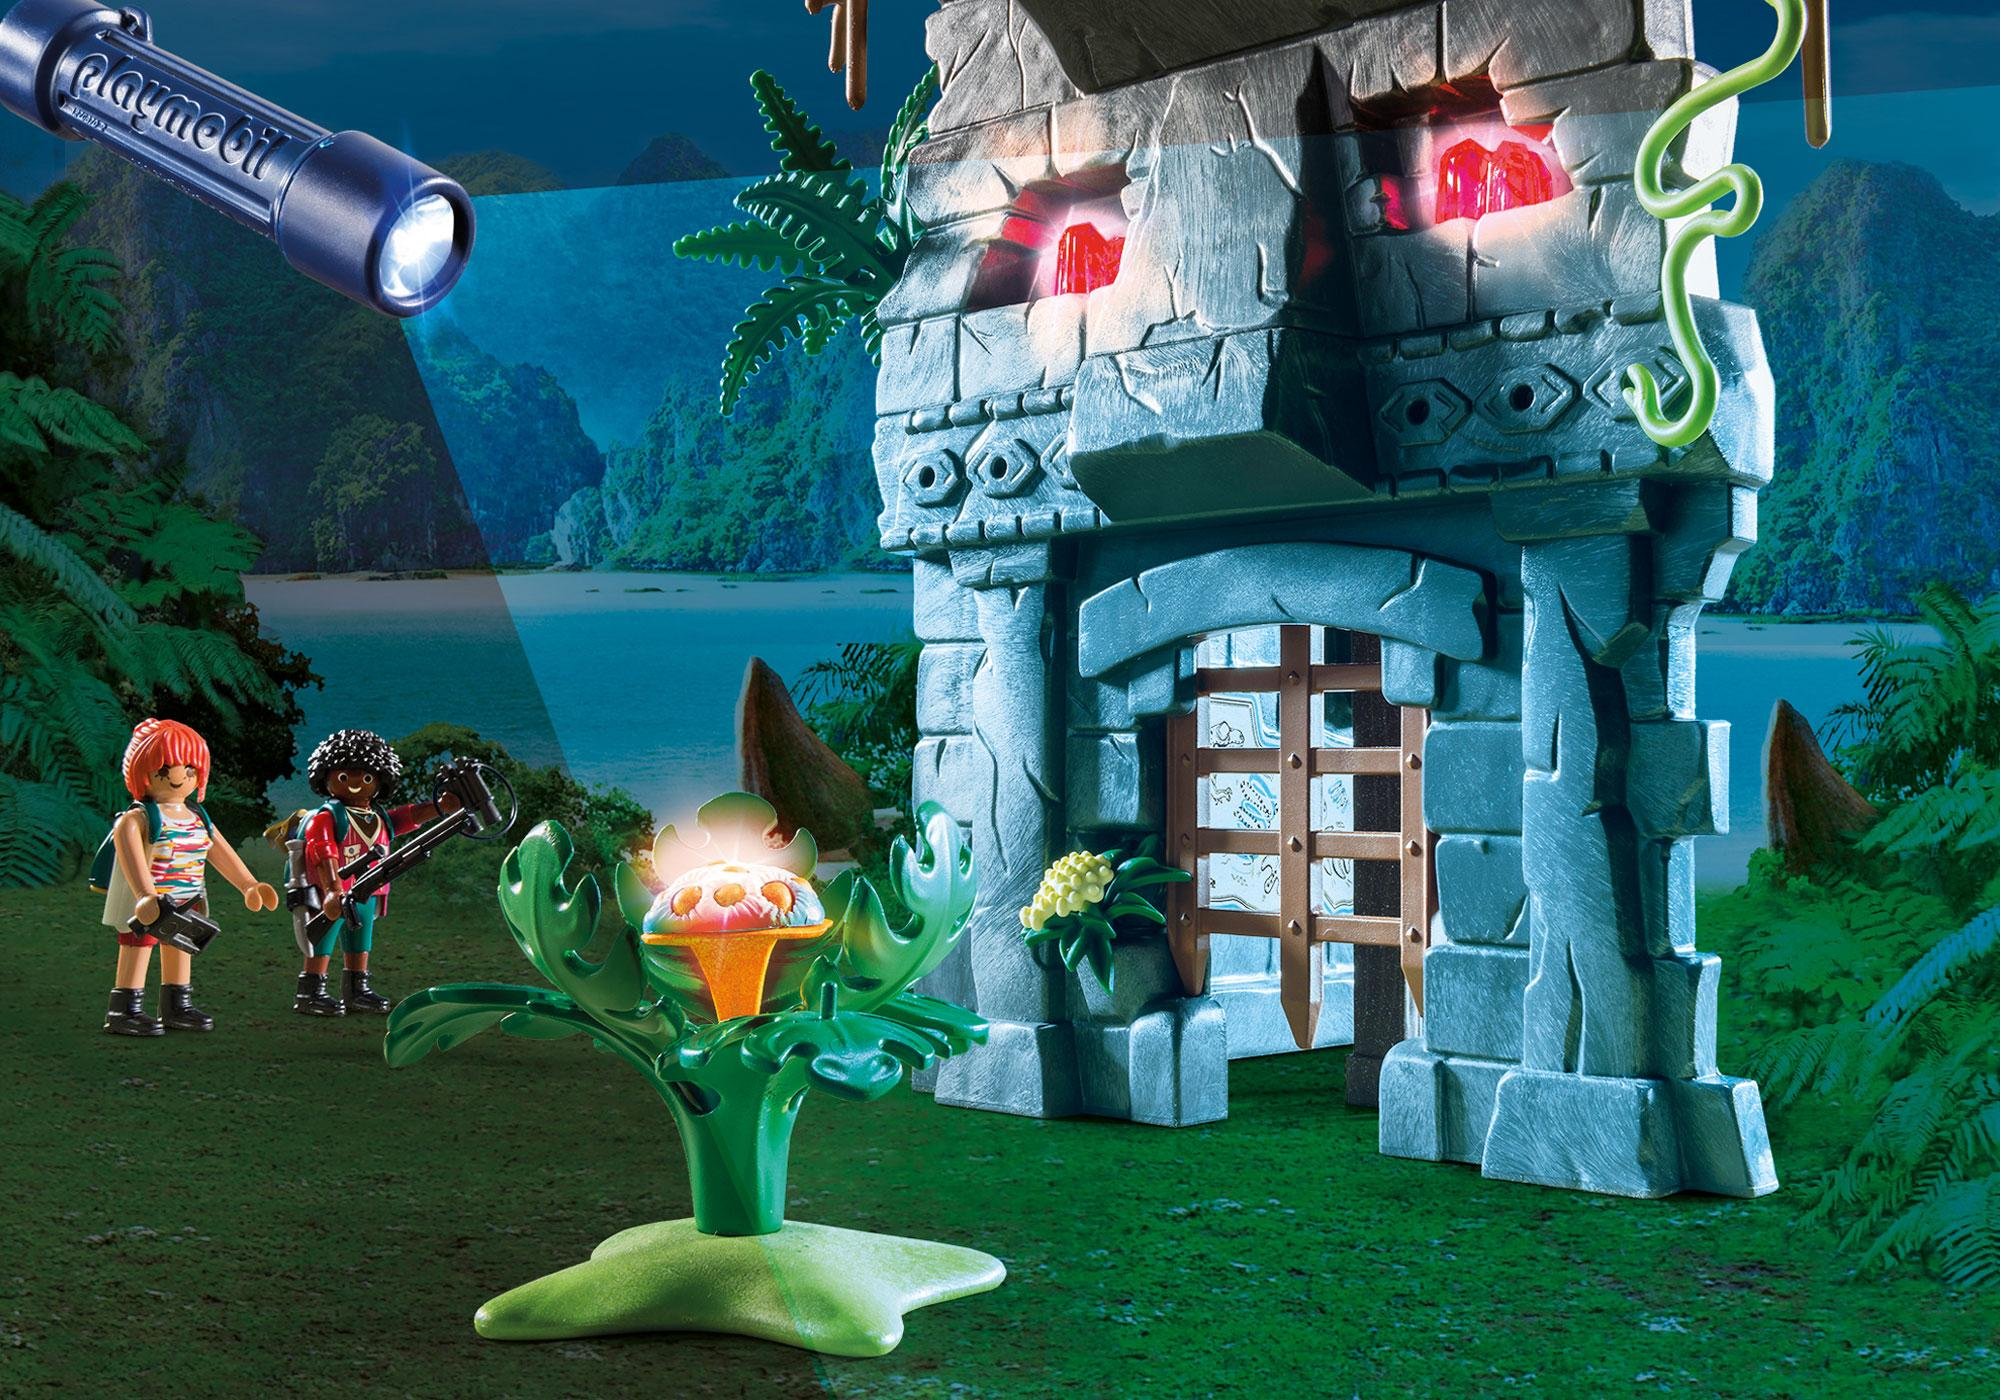 http://media.playmobil.com/i/playmobil/9429_product_extra1/Hidden Temple with T-Rex